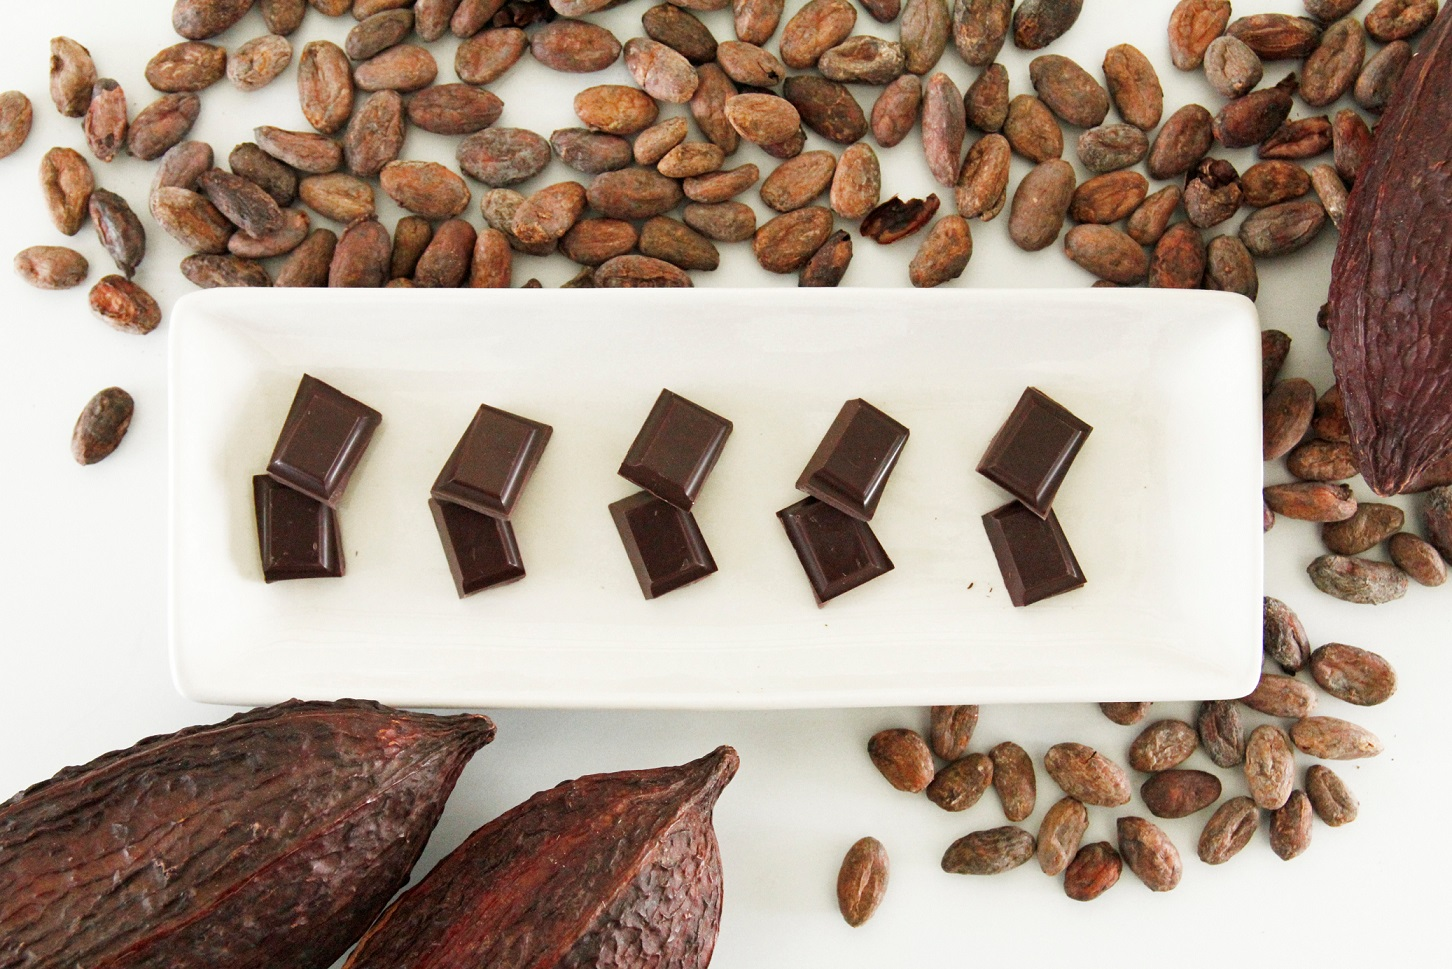 Bean to bar チョコレート・カカオ豆のテイスティング